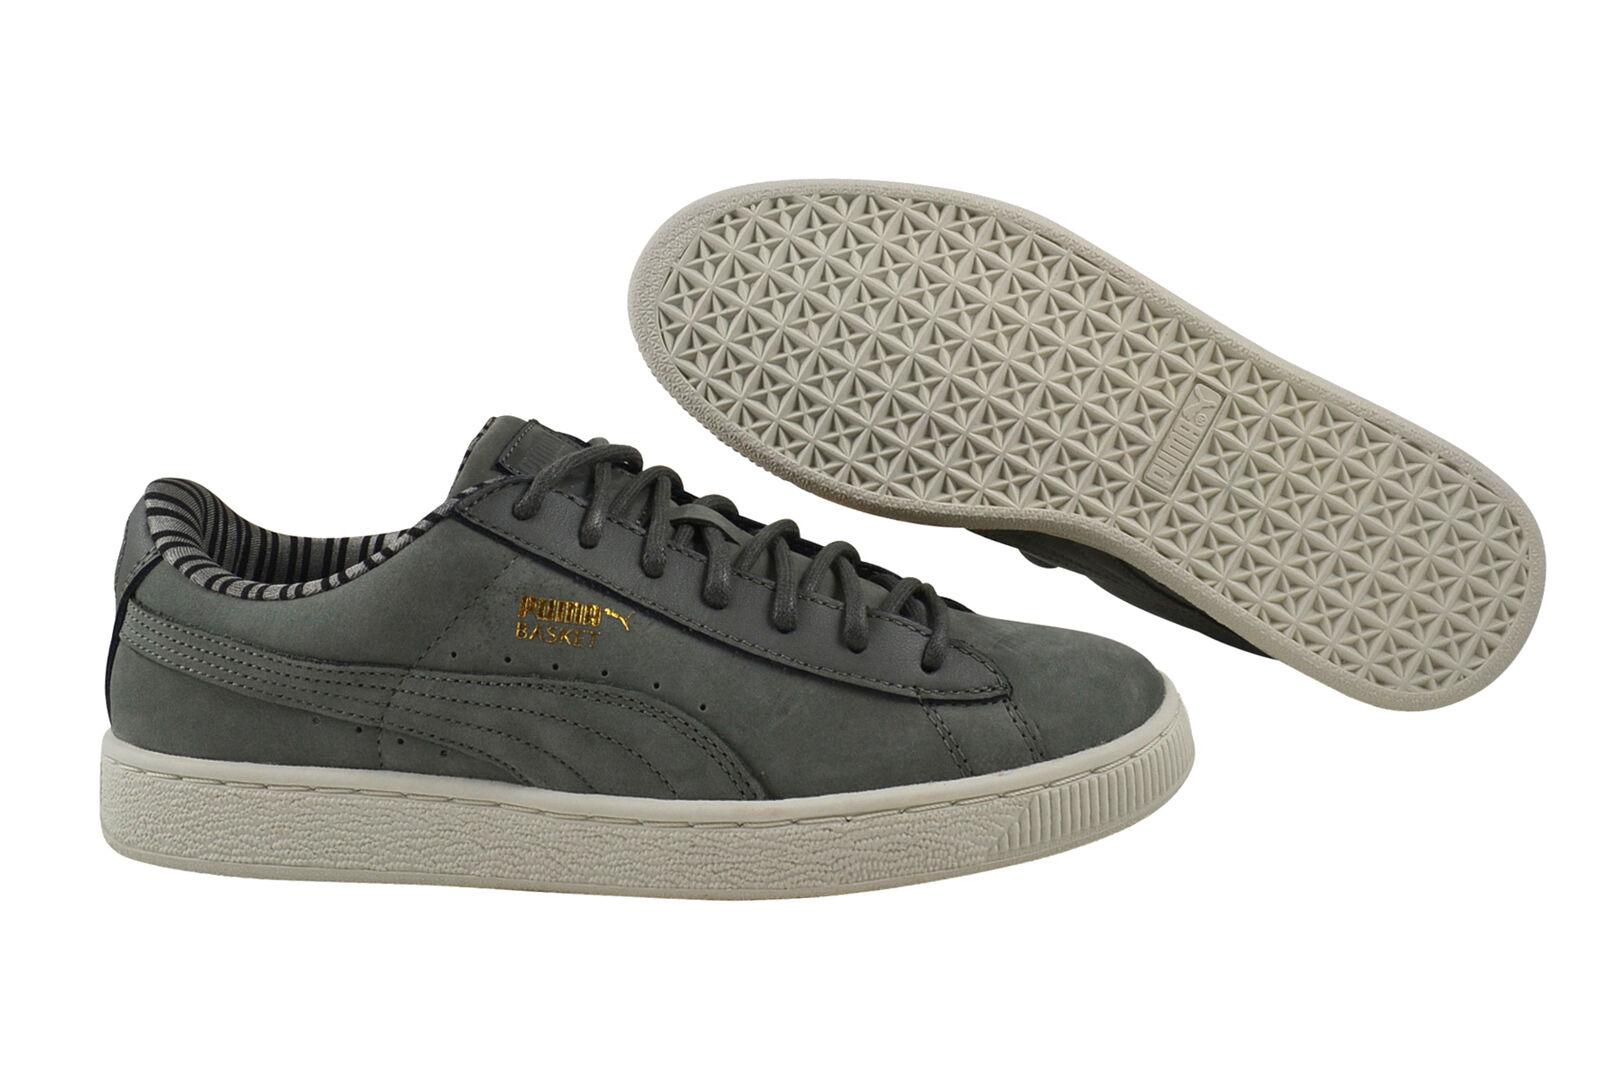 Puma Basket Classic Citi castor gray Sneaker/Schuhe grau 359938 02